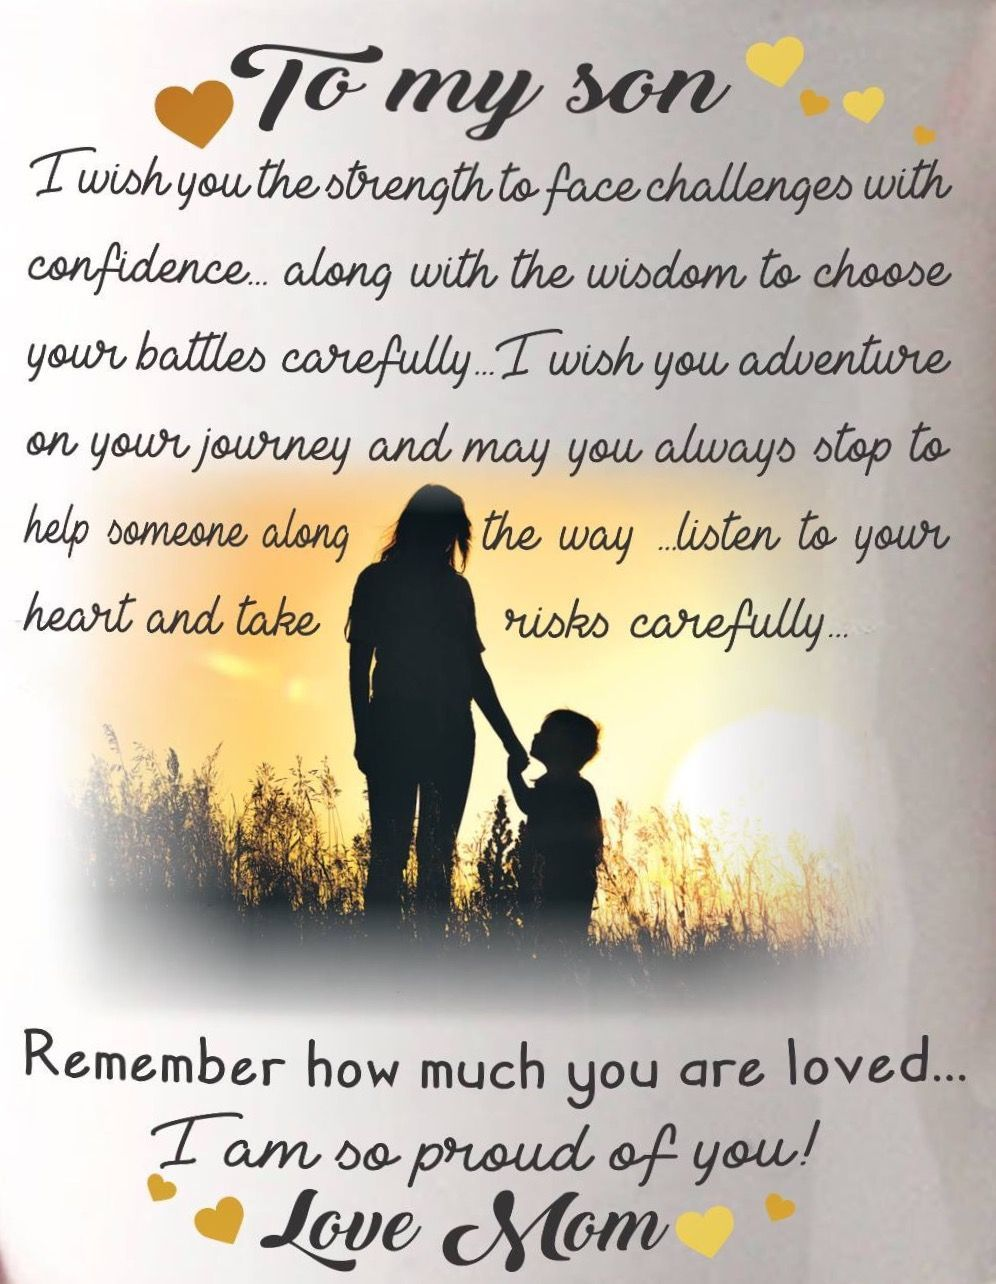 Love My Son Mother Son Bond Still Always A Daily Challange